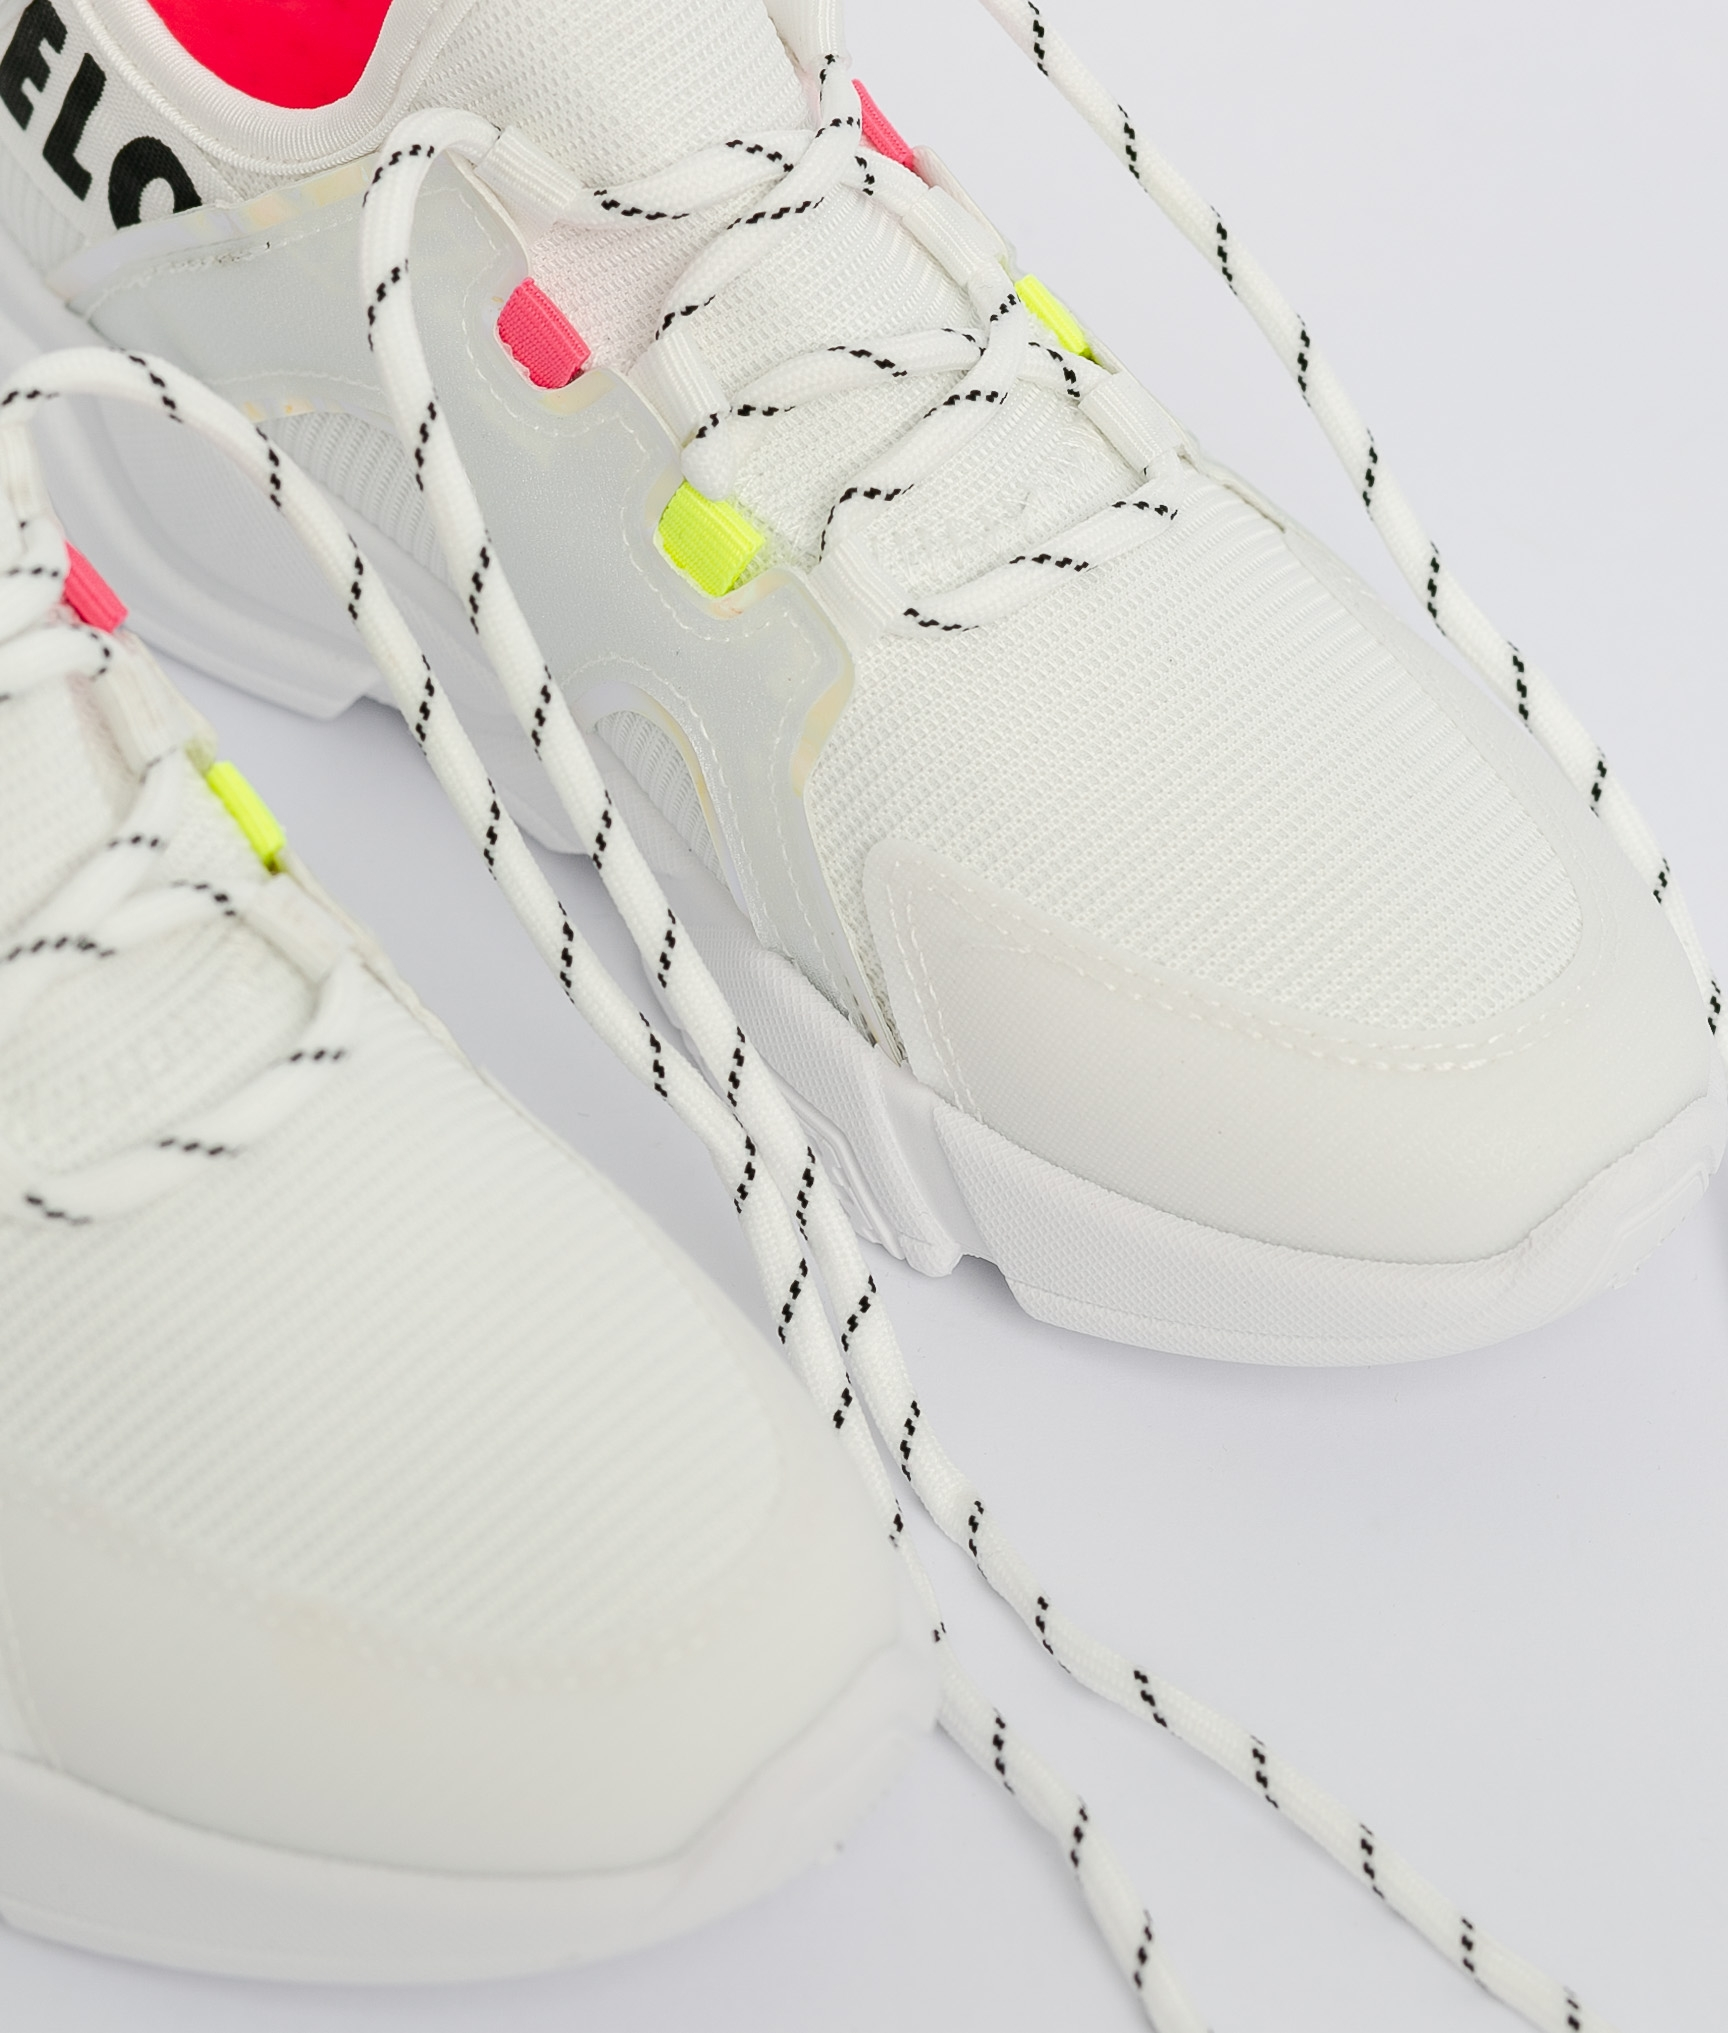 Sneakers Fluorina - Branco/Vermelho